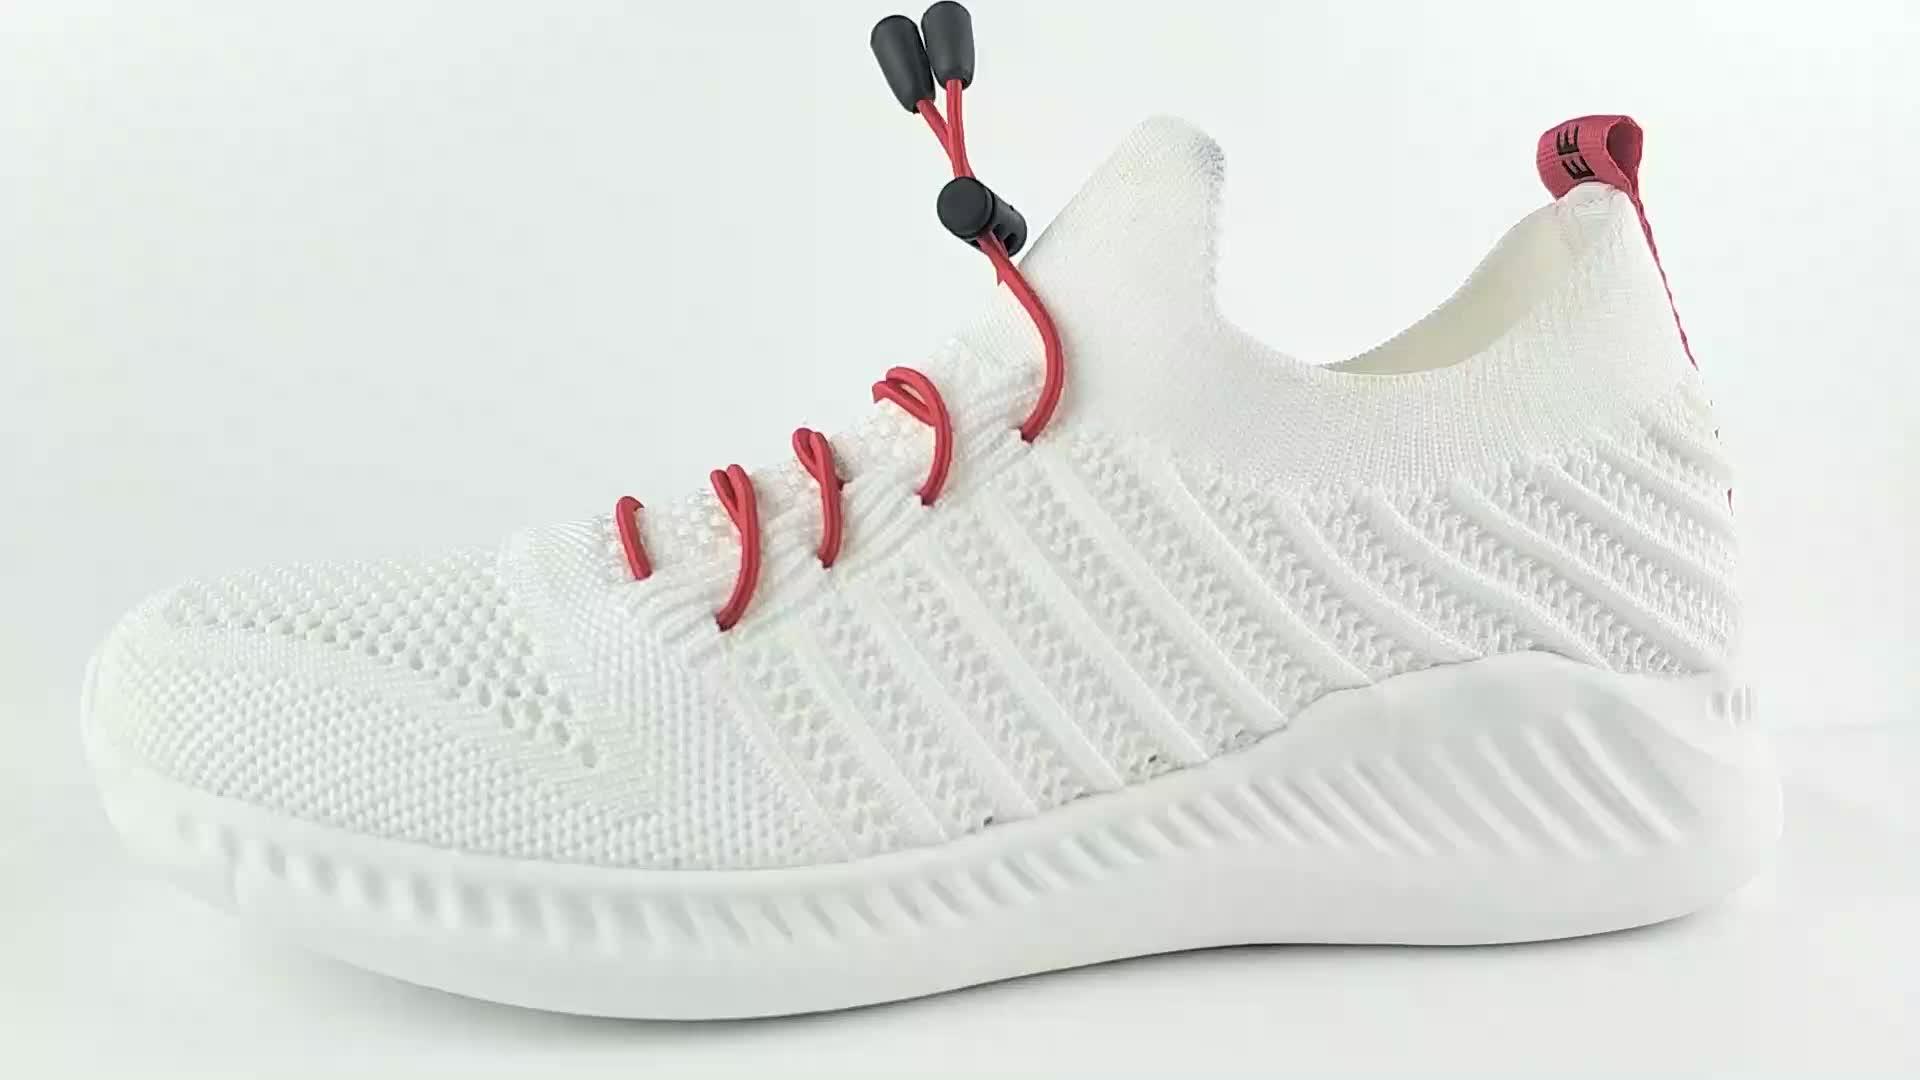 Awesome simple design wholesale best sale flat bottom cozy black leisure walking shoes sneakers men